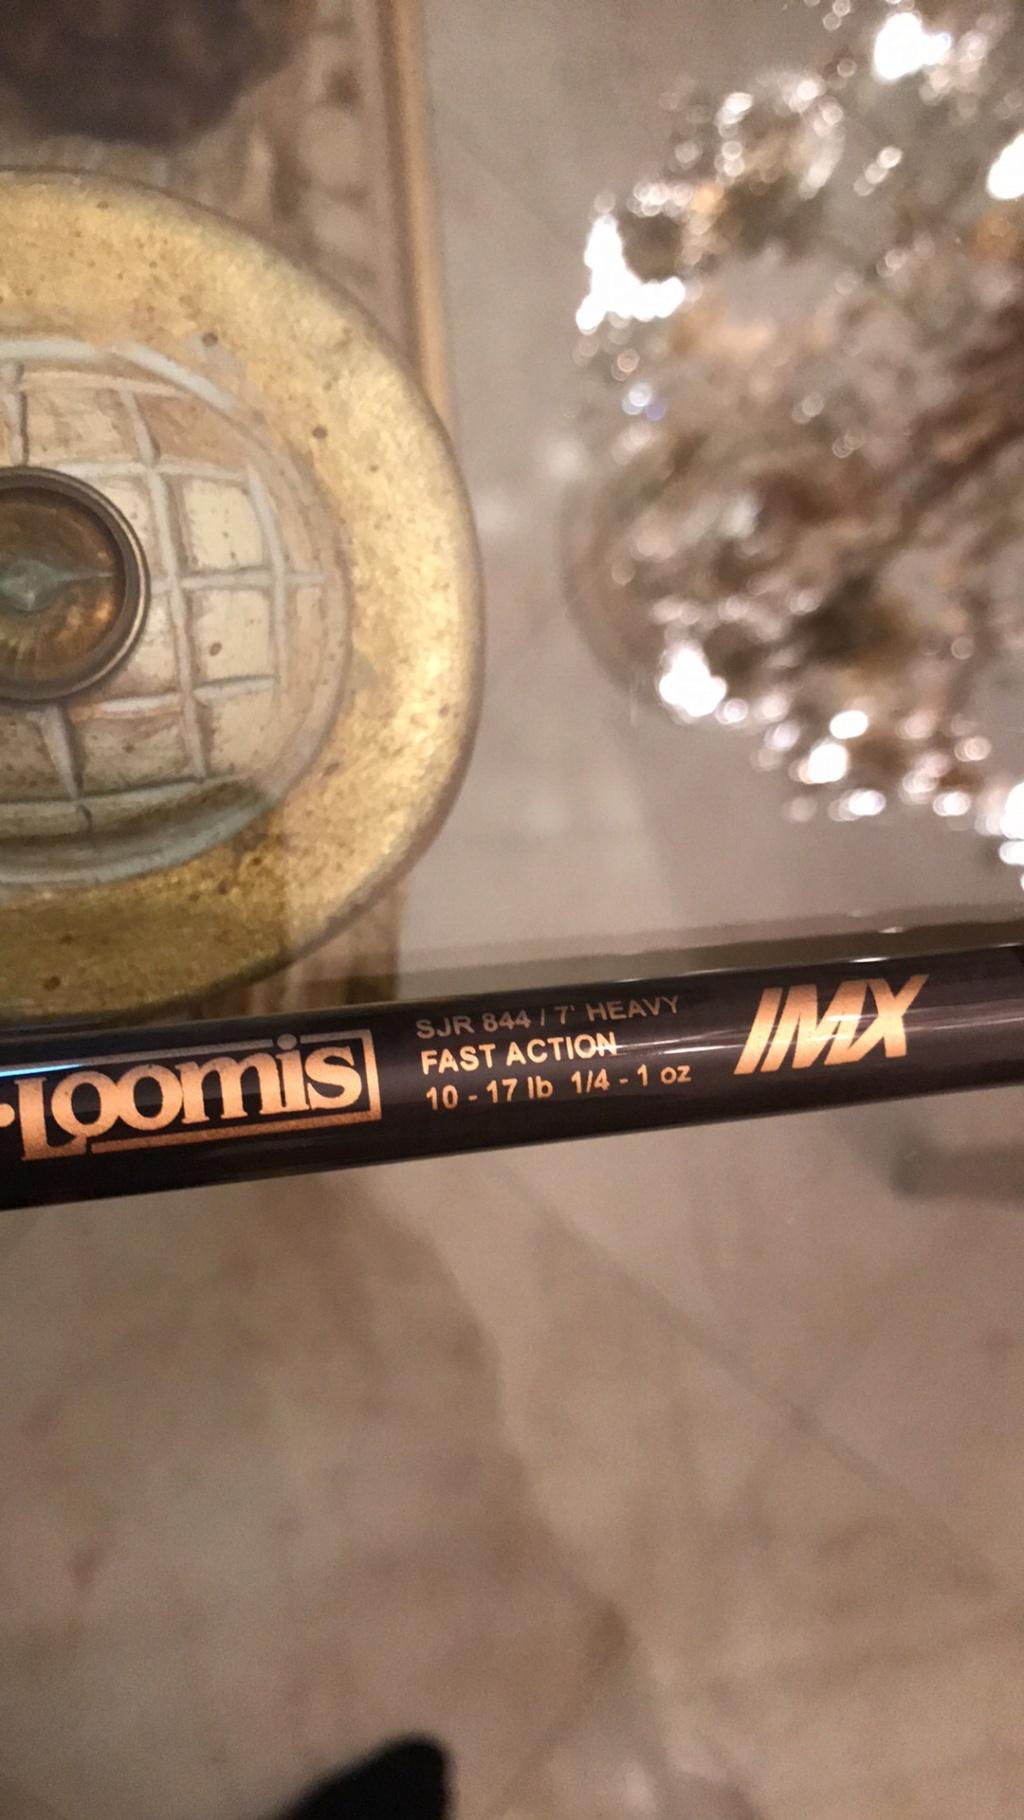 [Vendo] GLoomis SJR844 IMX ( nuova da negozio ) 70ced410